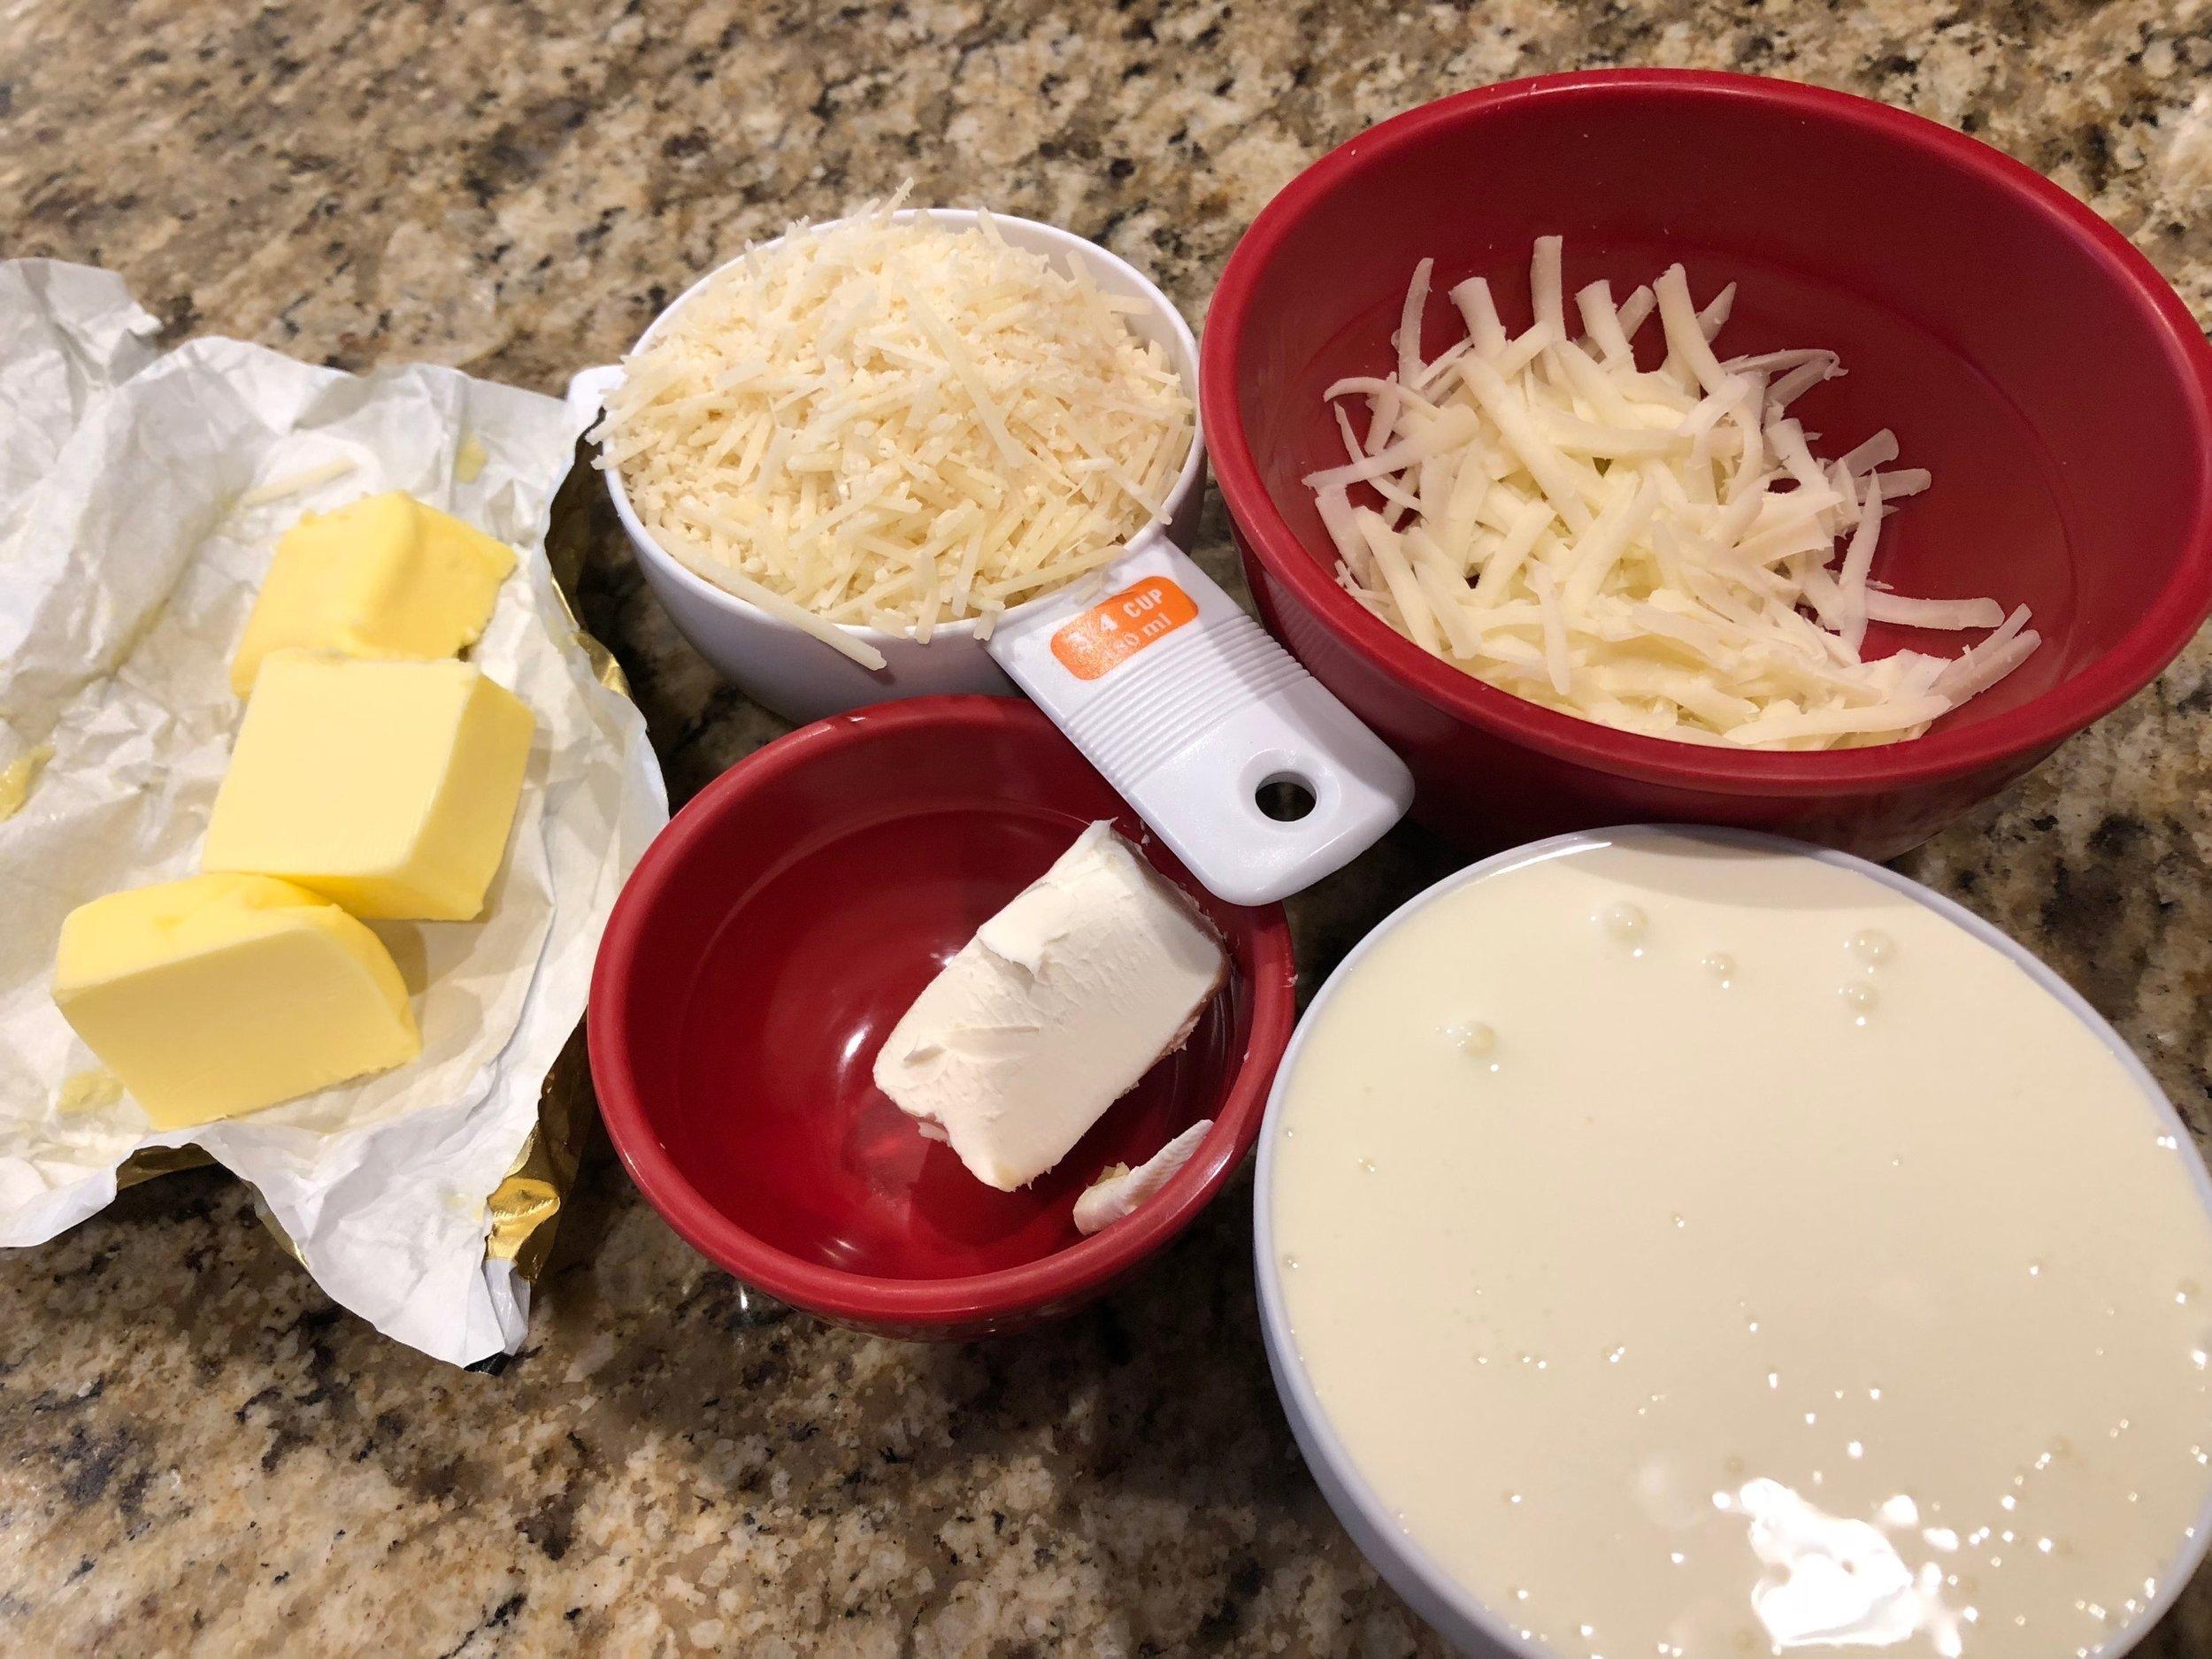 Keto and low carb chicken alfredo dinner casserole recipe